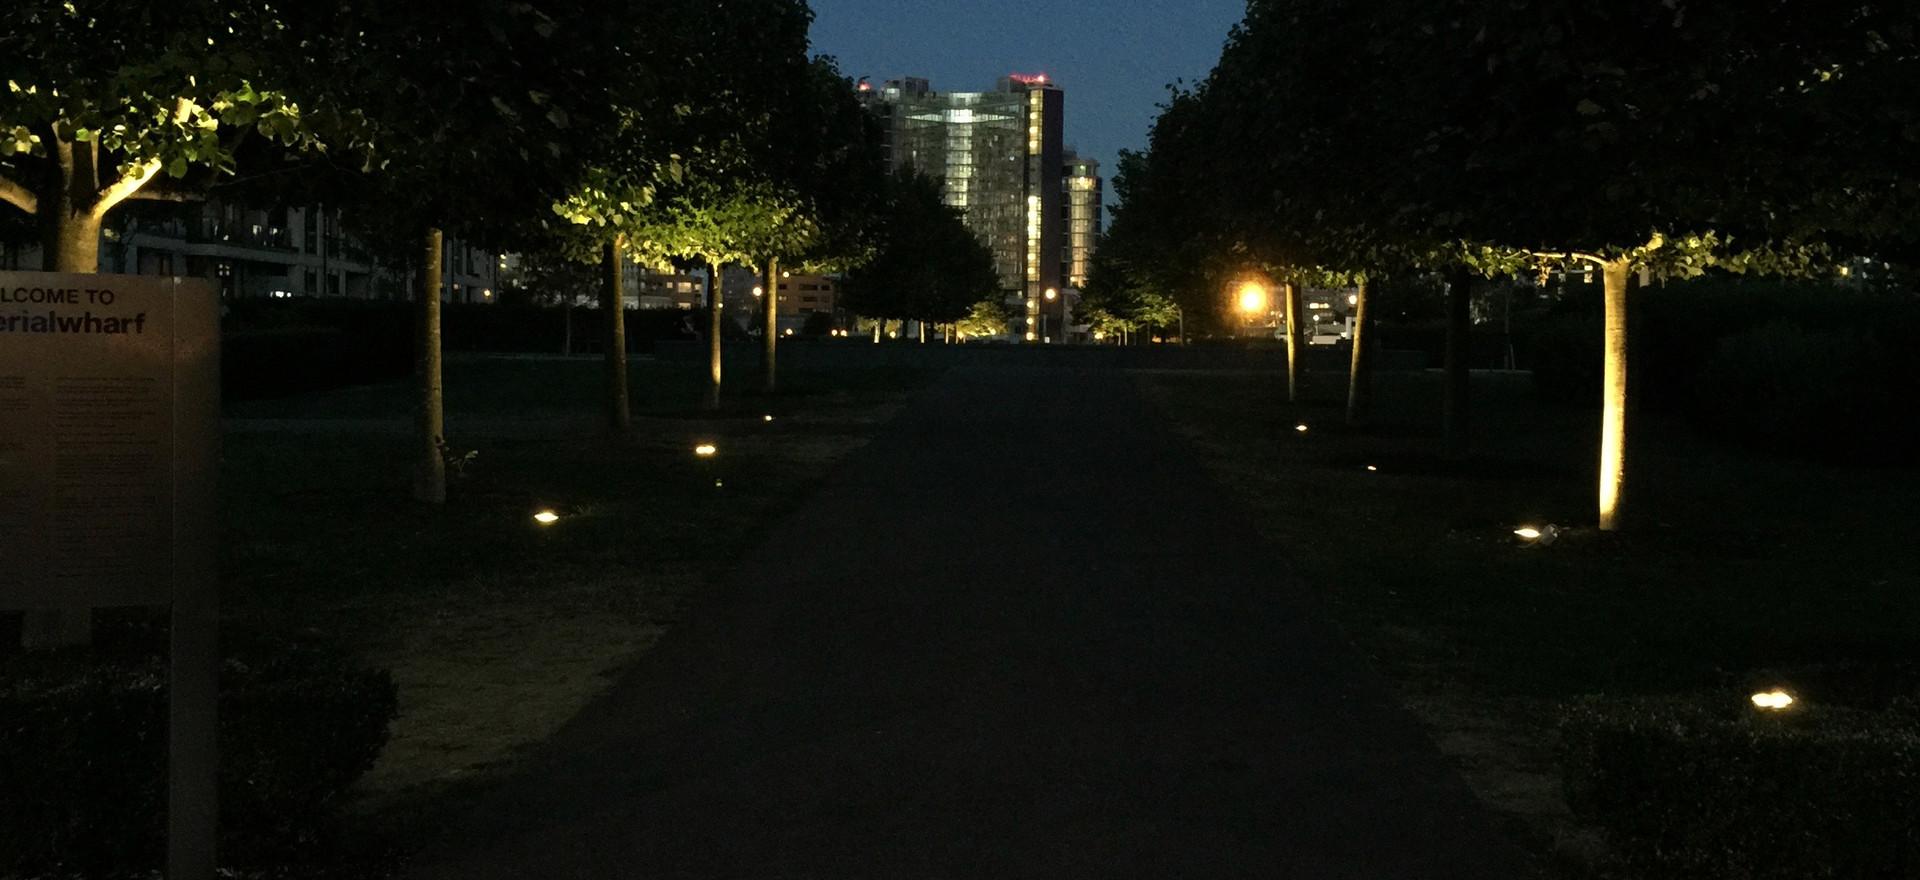 Imperial Park, Imperial Wharf